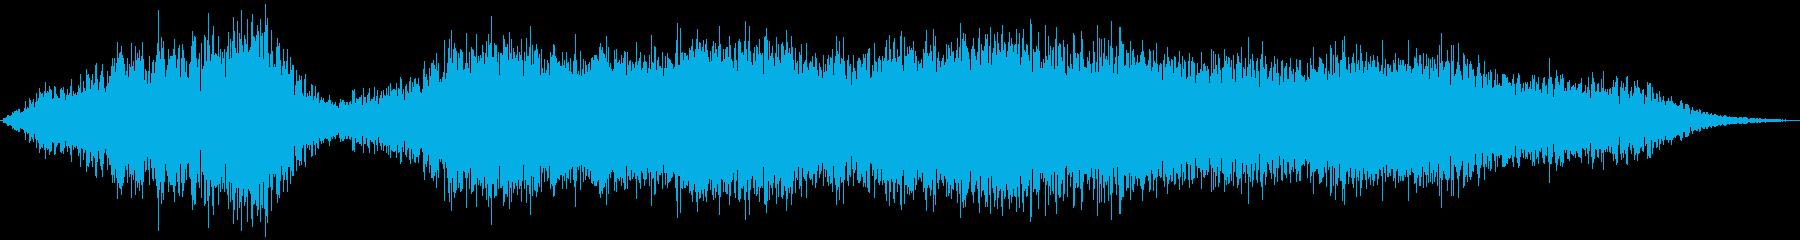 PADS 底流01の再生済みの波形